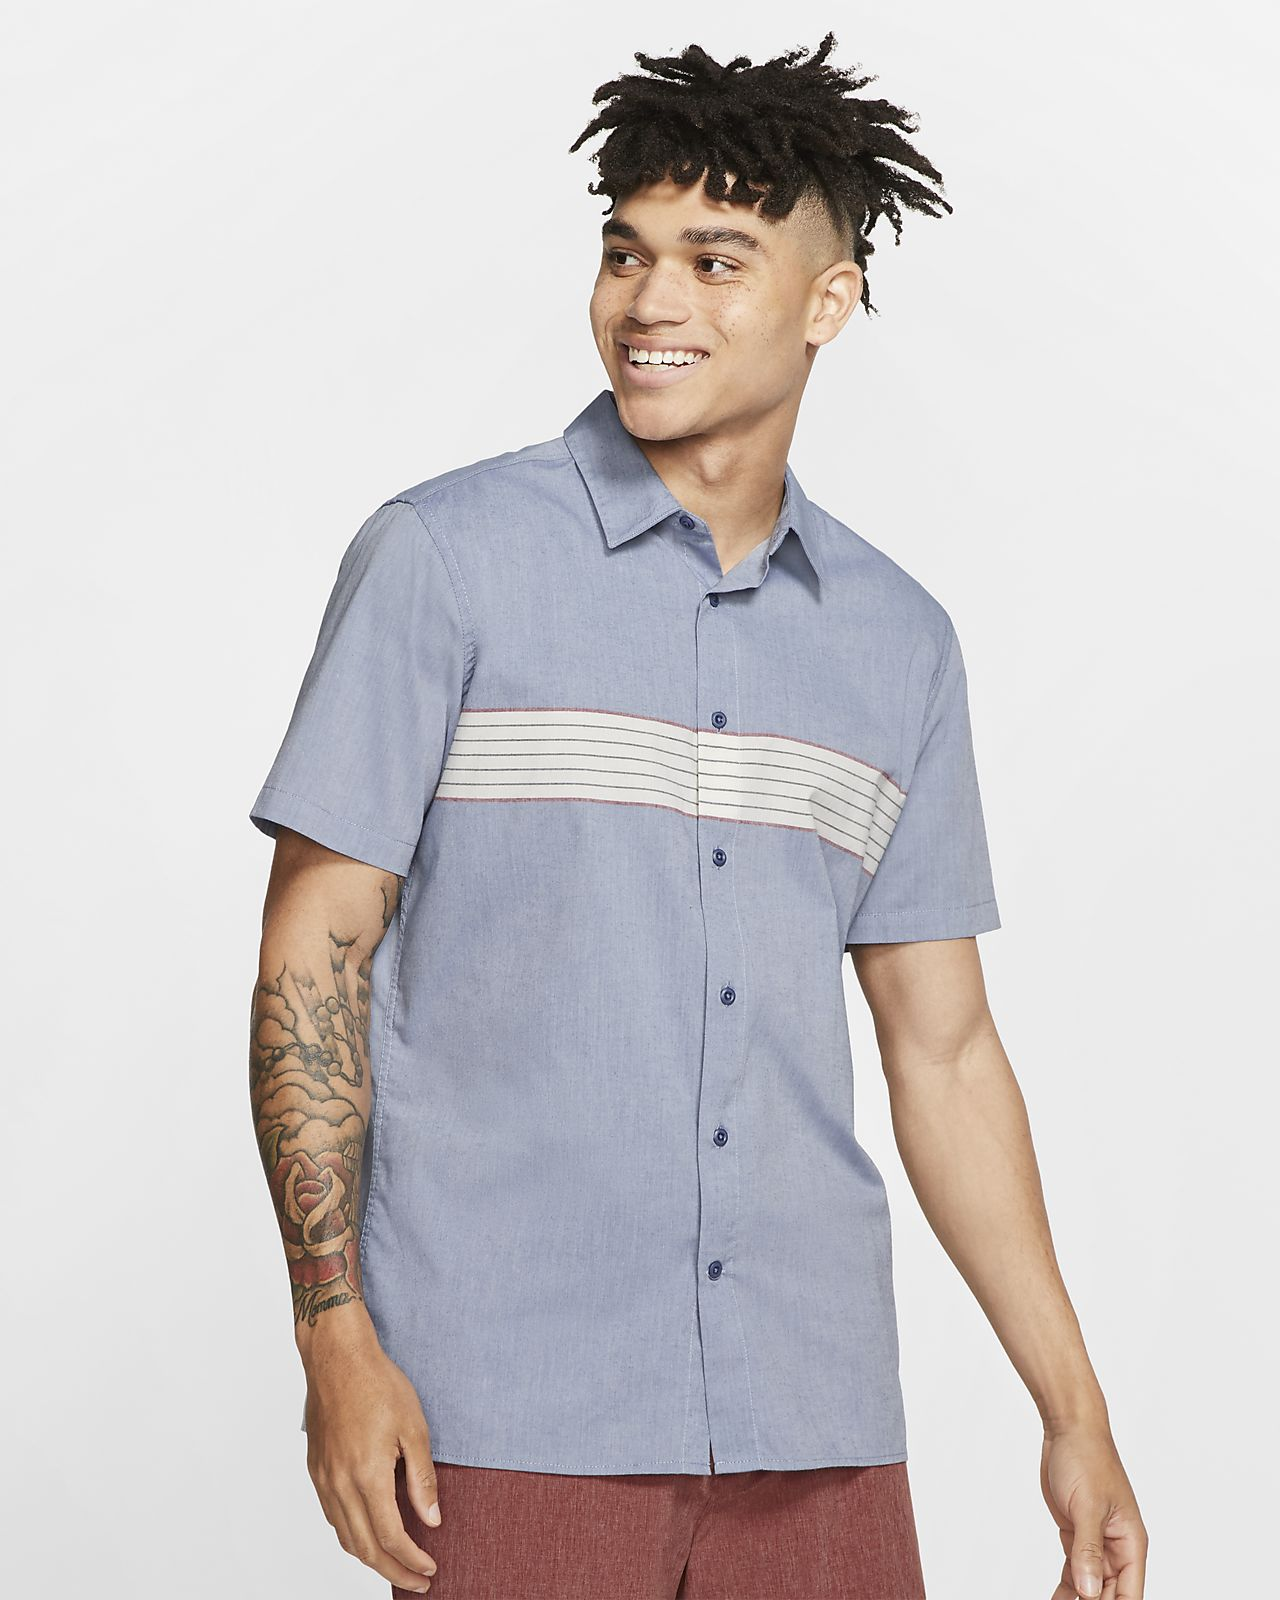 Hurley Dri-FIT Maritime Men's Short-Sleeve Top